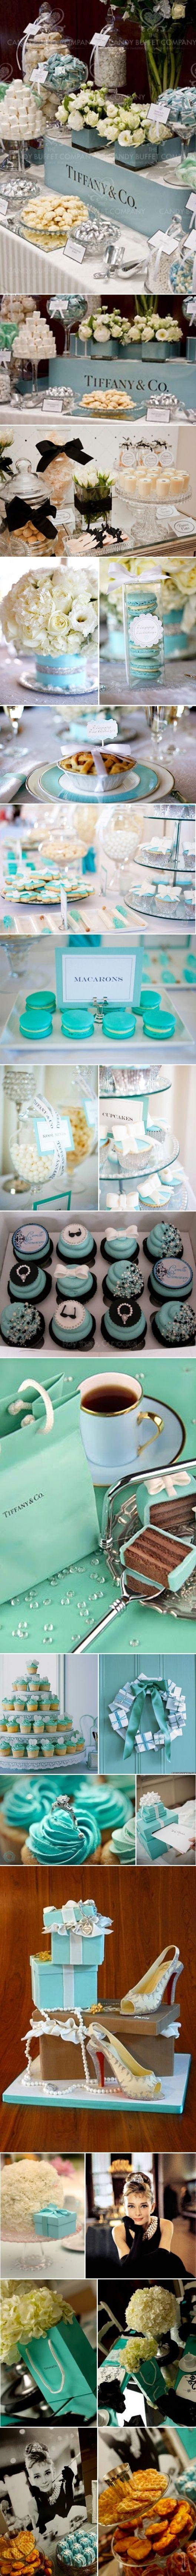 Breakfast at Tiffany's theme bridal shower <3